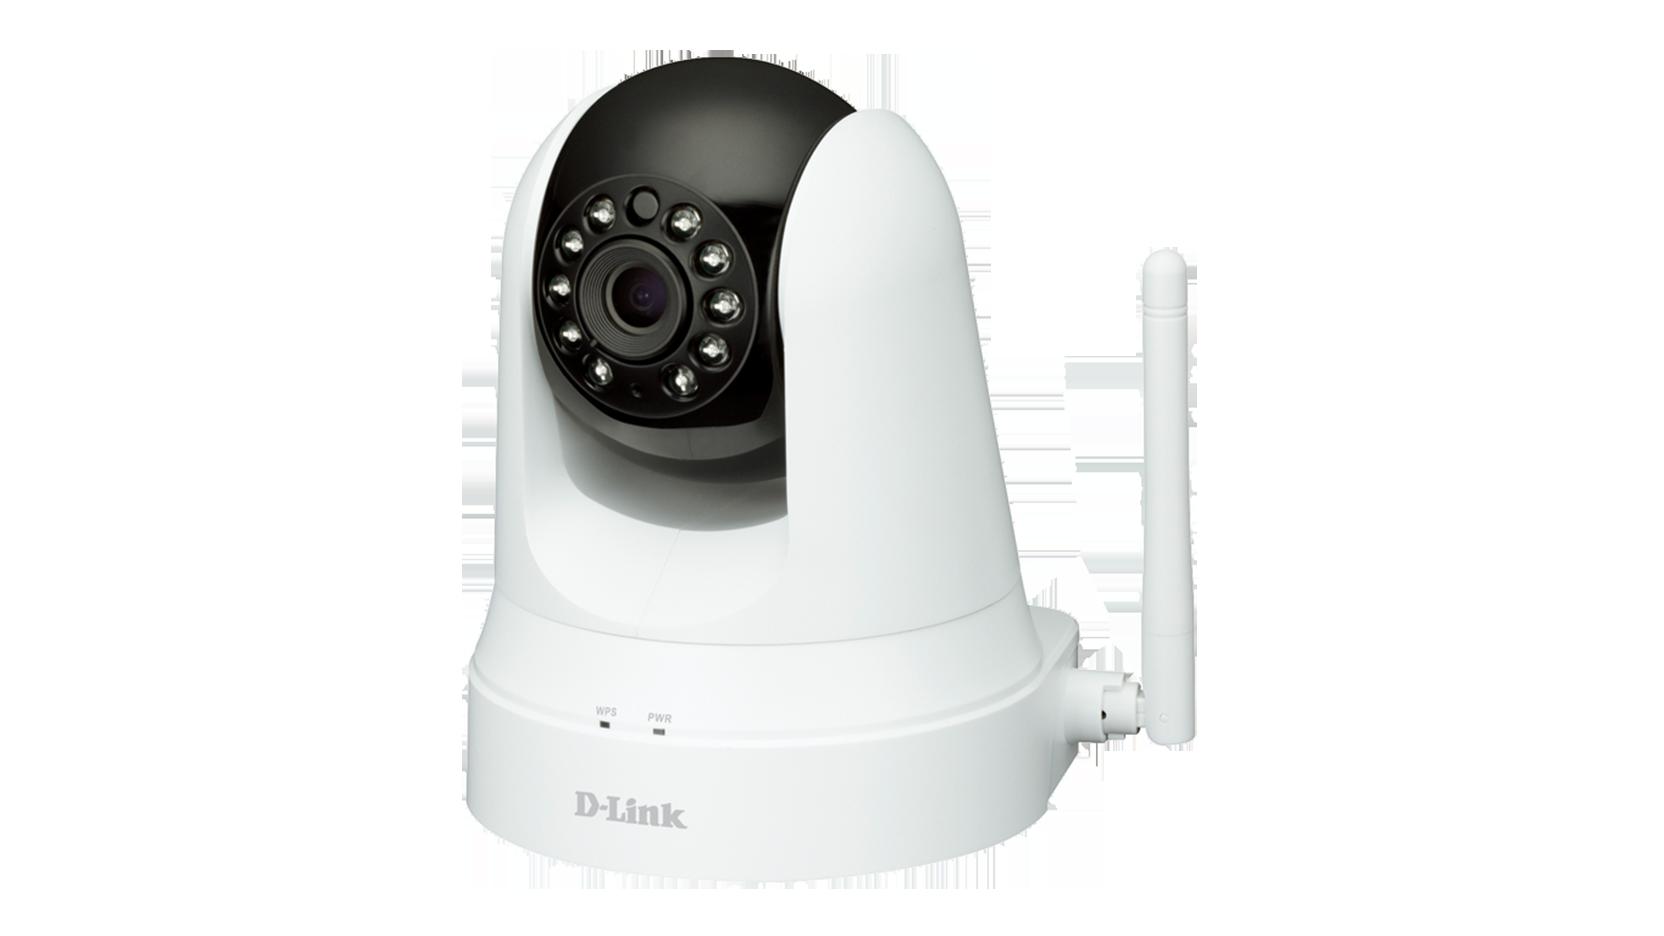 Pan & Tilt Wi-Fi Camera DCS-5020L | D-Link